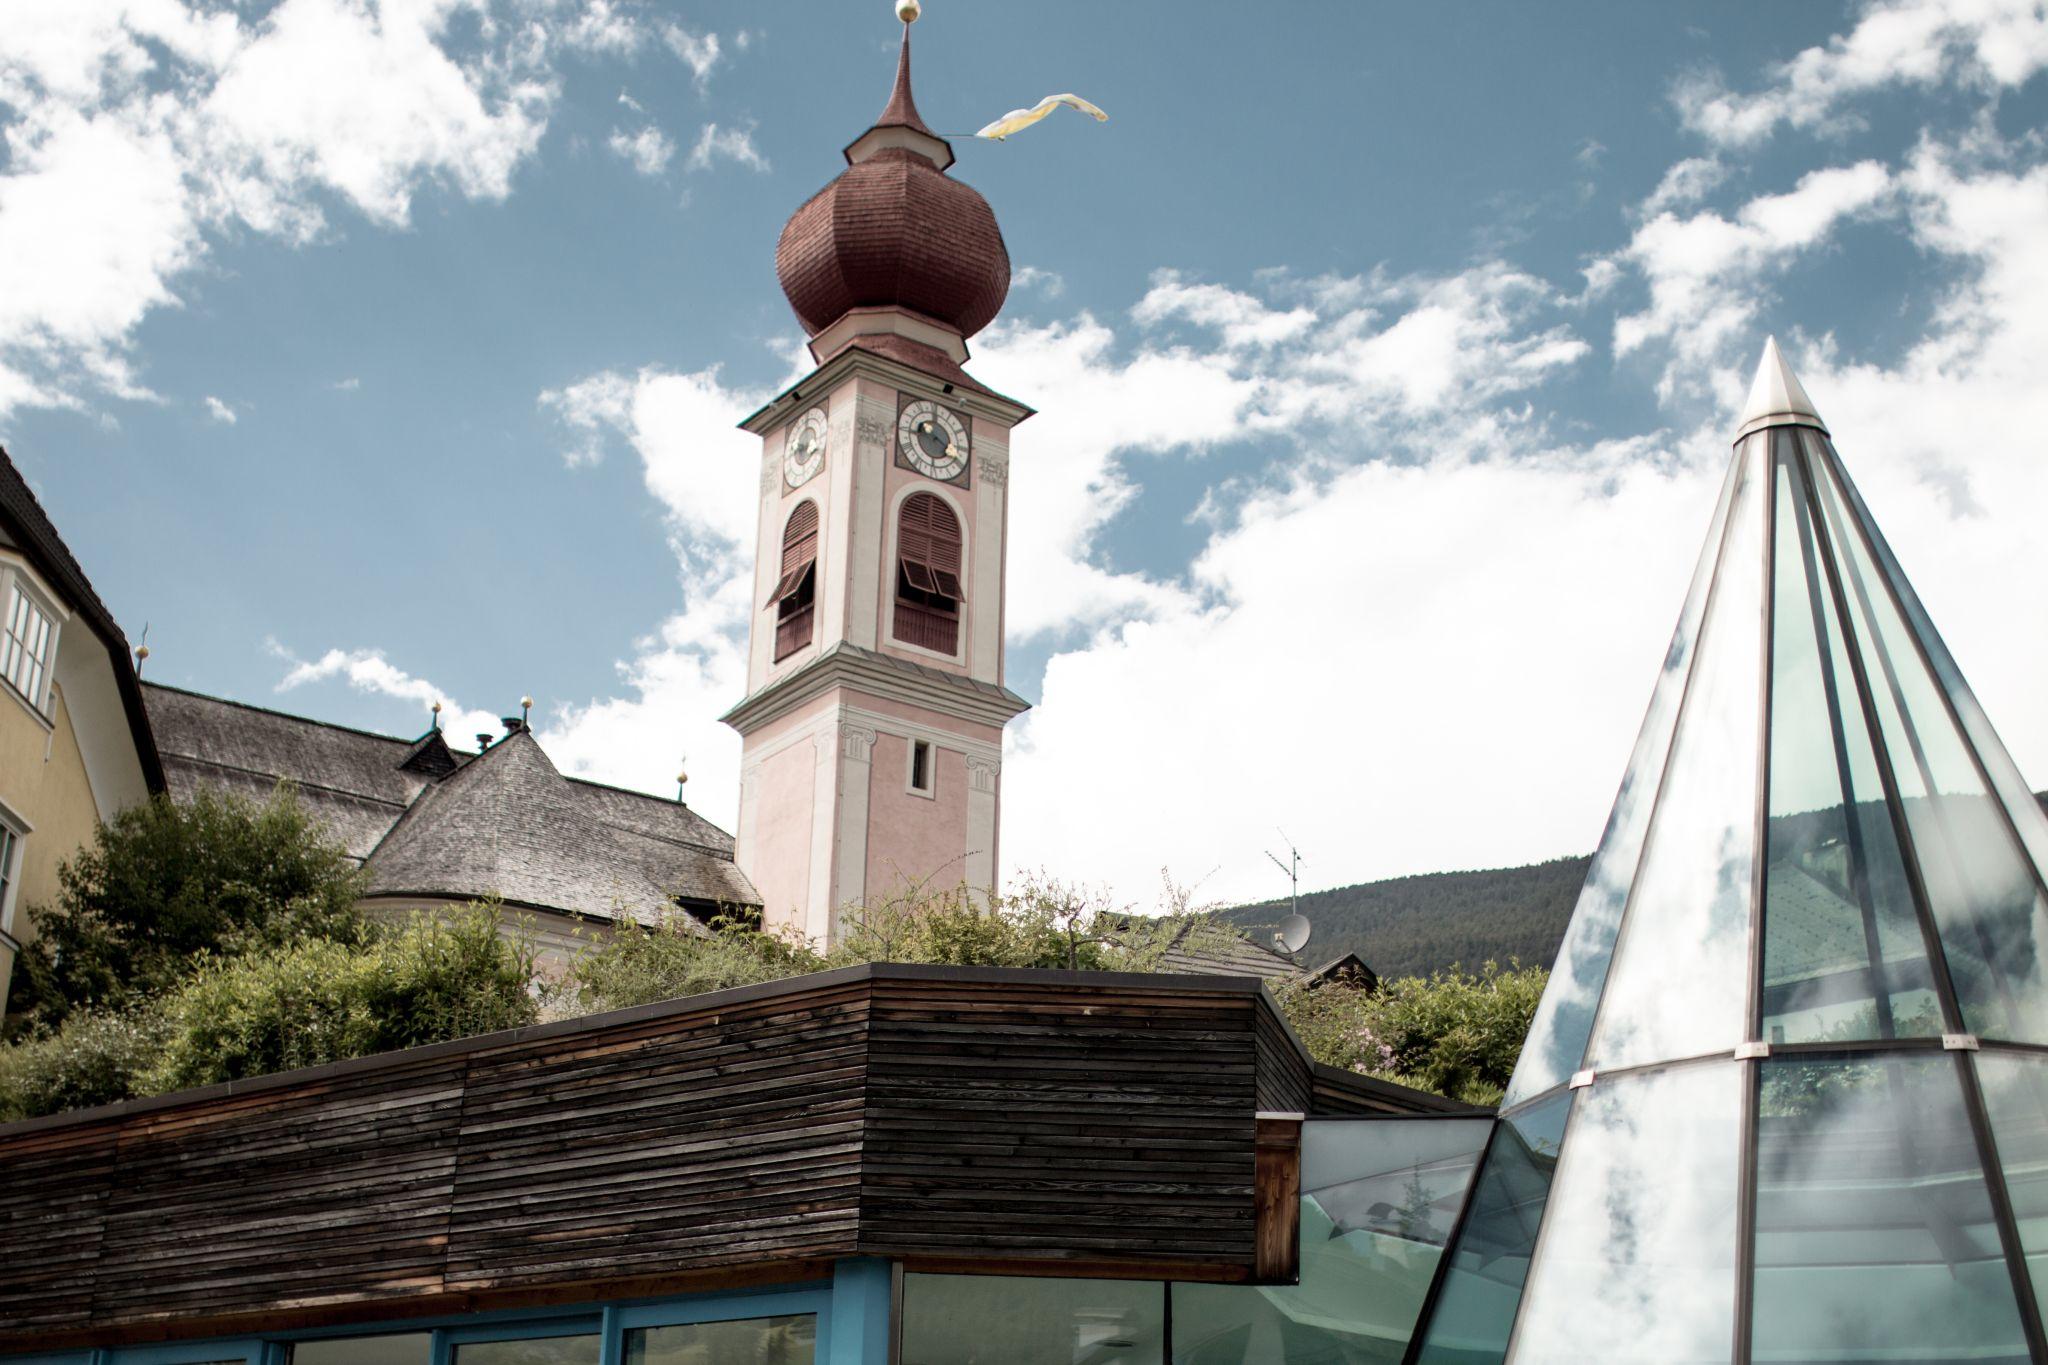 Adler Dolomites Ortisei Italy Hotel Hospitality Brand Photography Exterior Pool